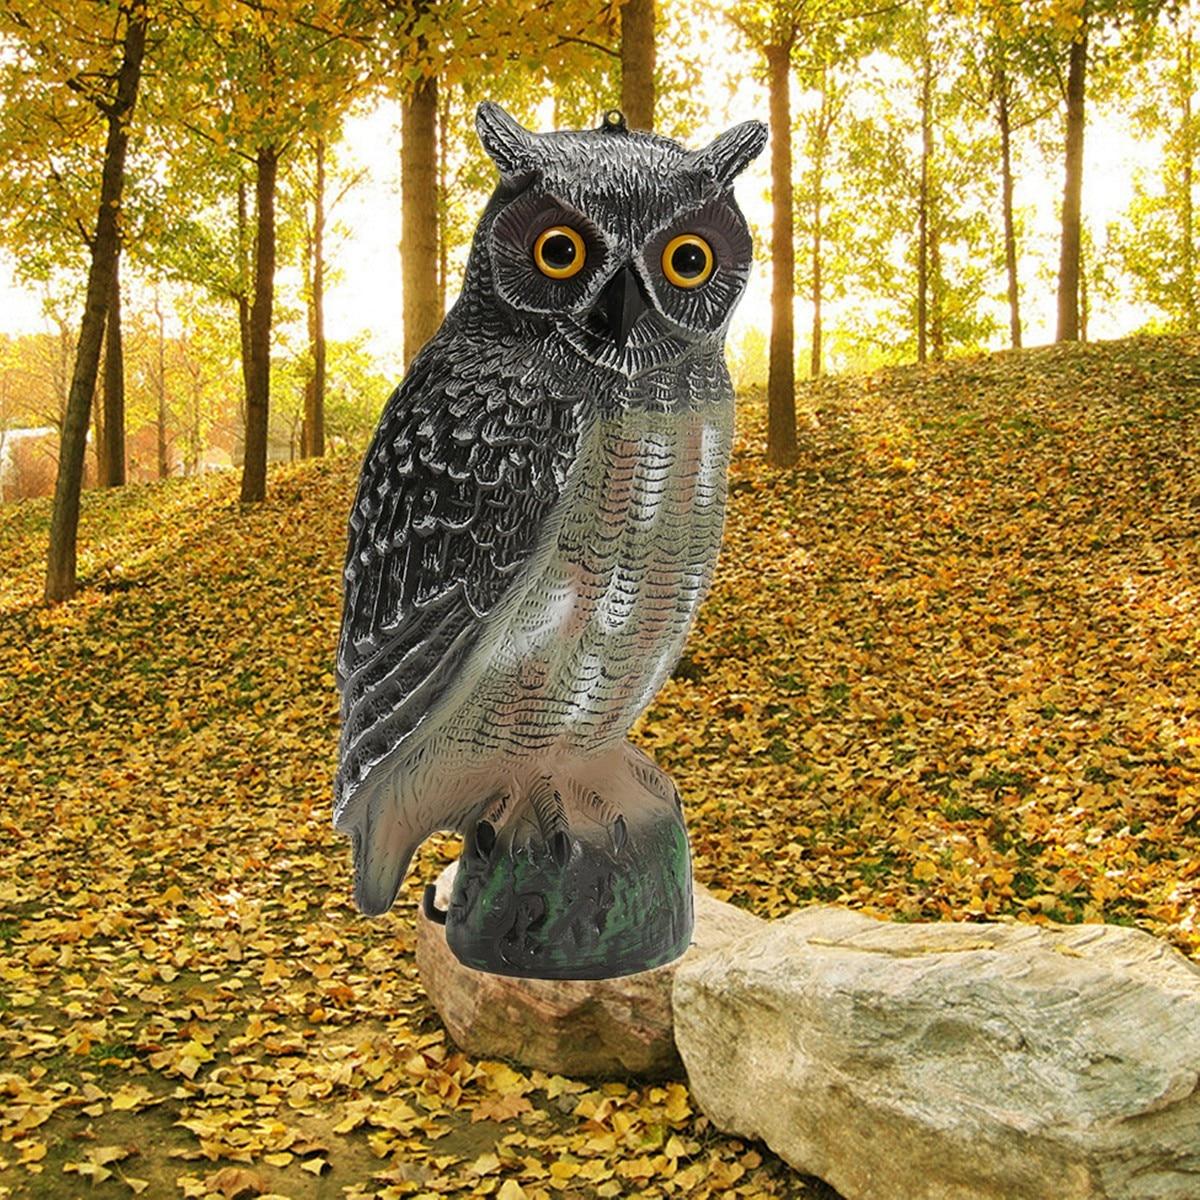 New Lifelike 3D Outdoor Hunting Decoys Plastic Fake Owl Garden Decor ...